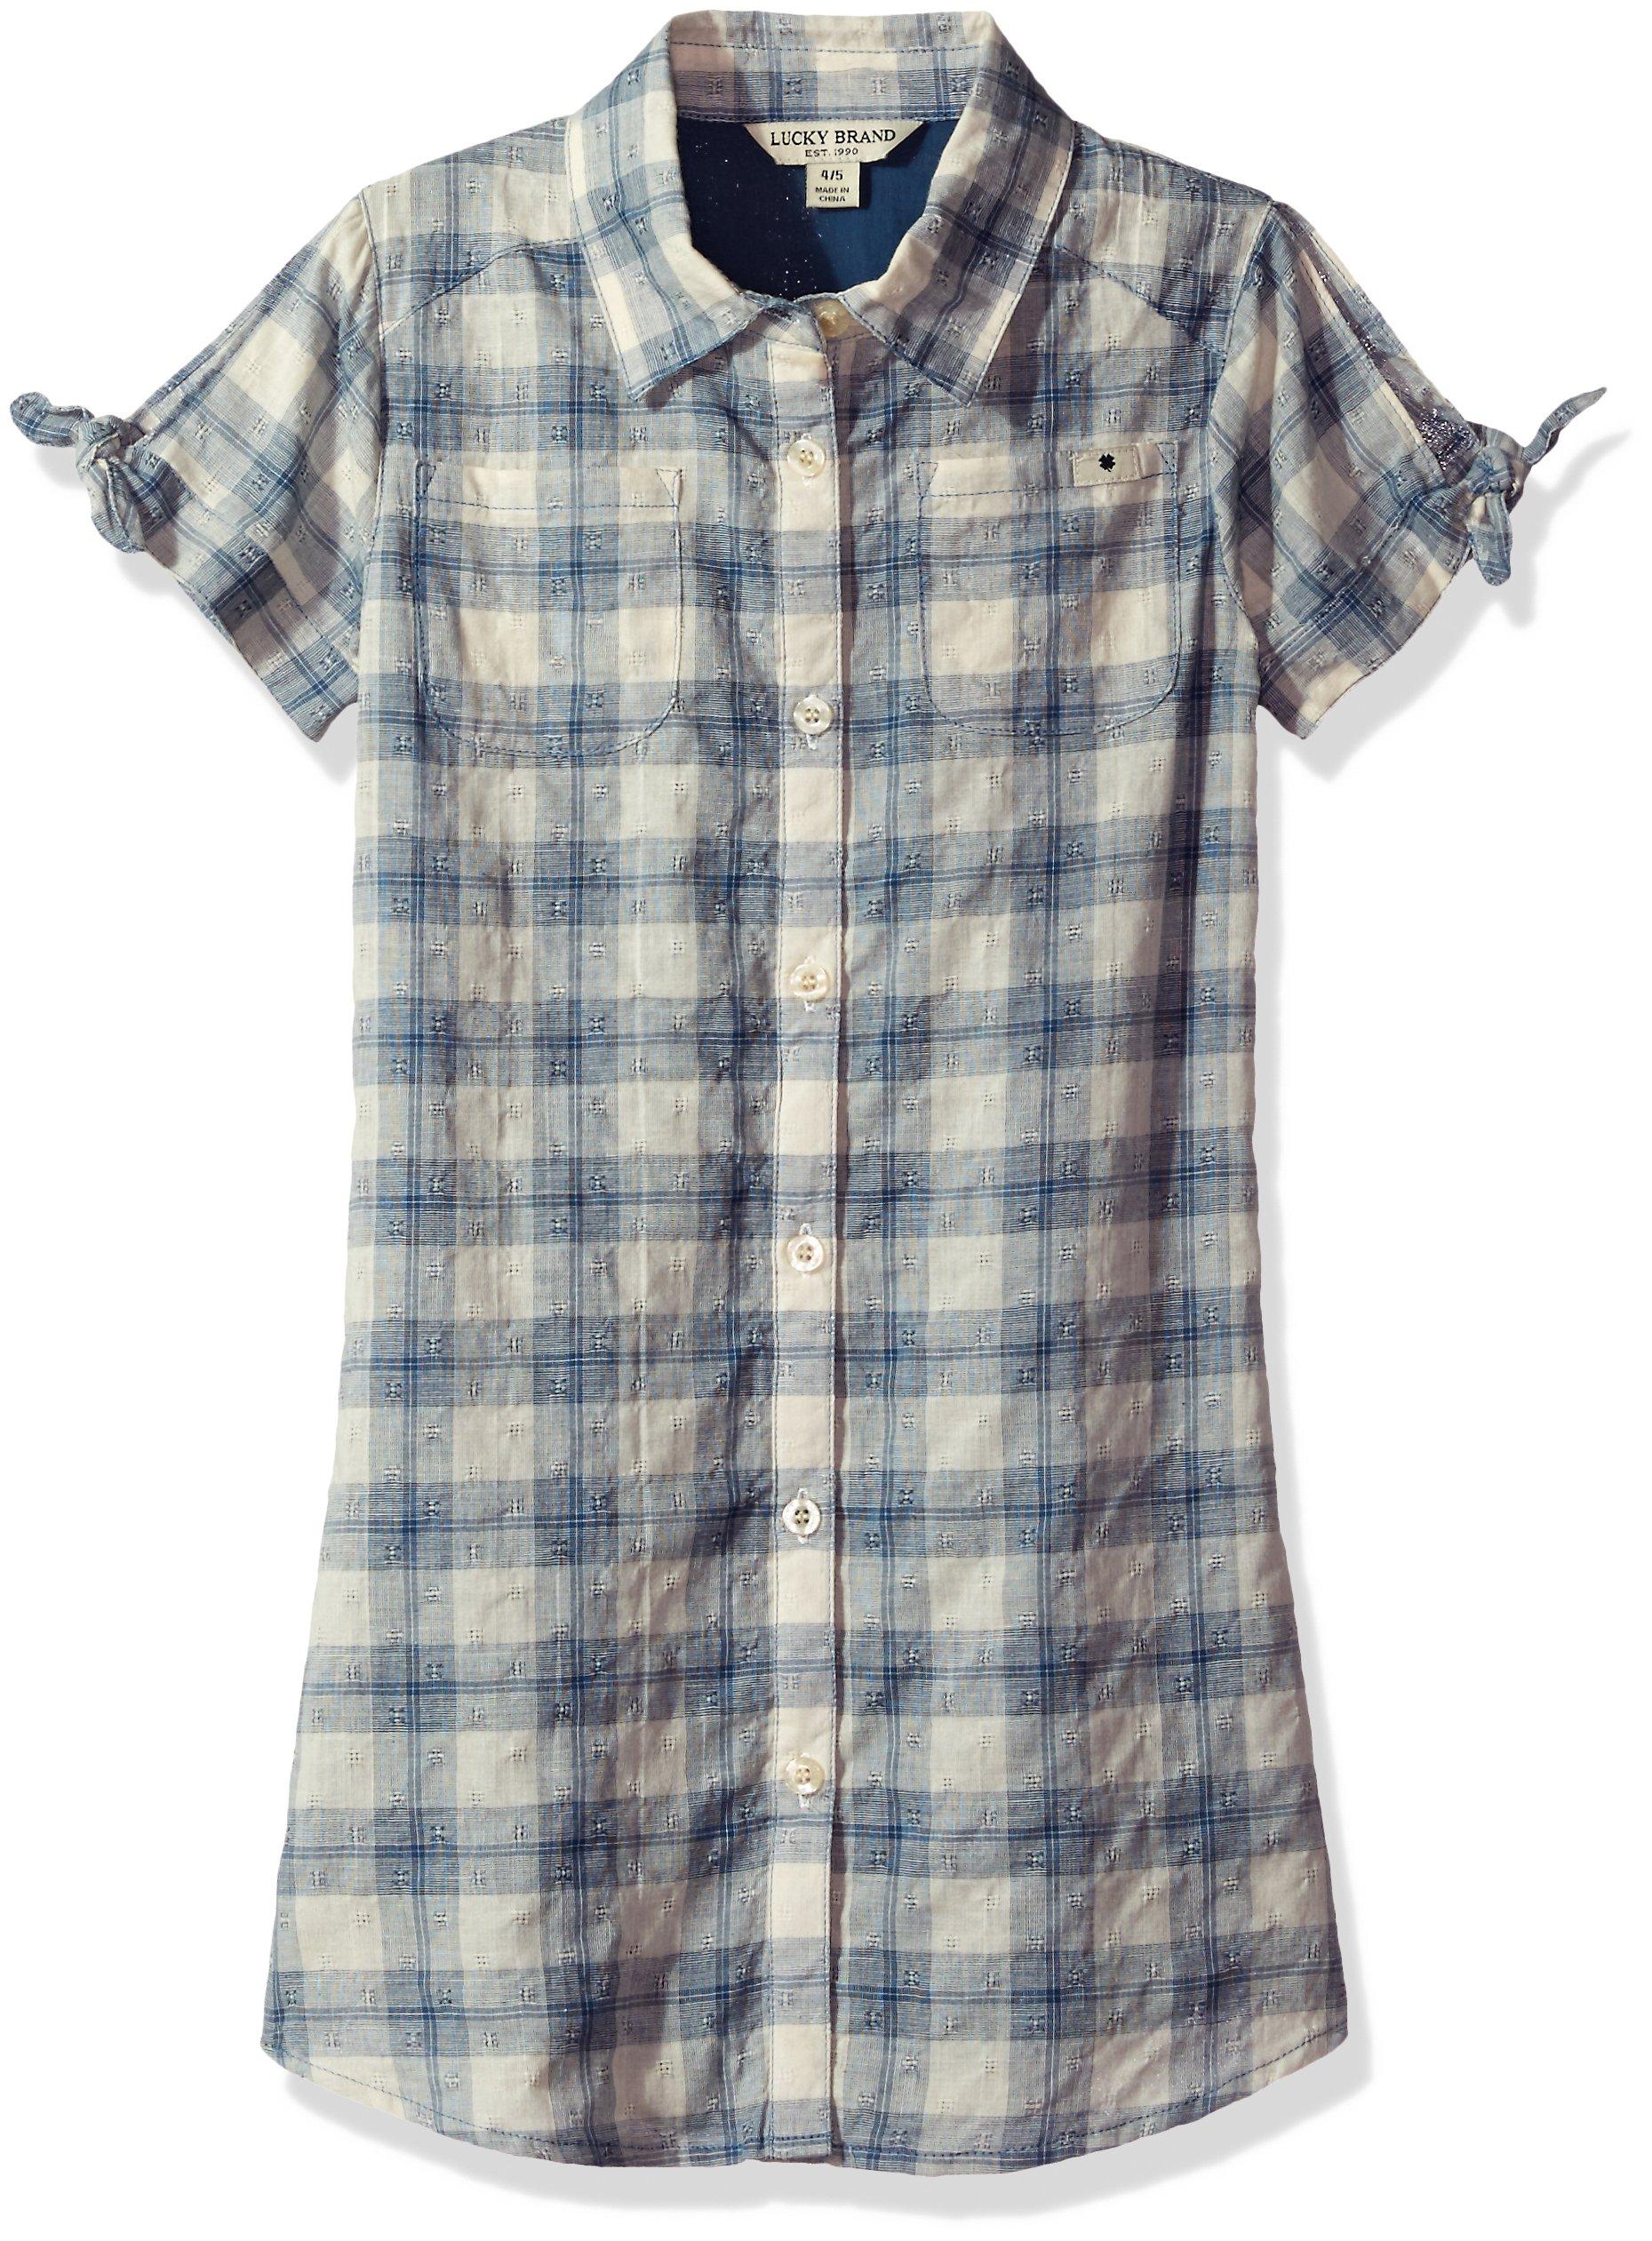 Lucky Brand Big Girls' Short Sleeve Fashion Dress, Bree Dark Denim, Large (12/14)